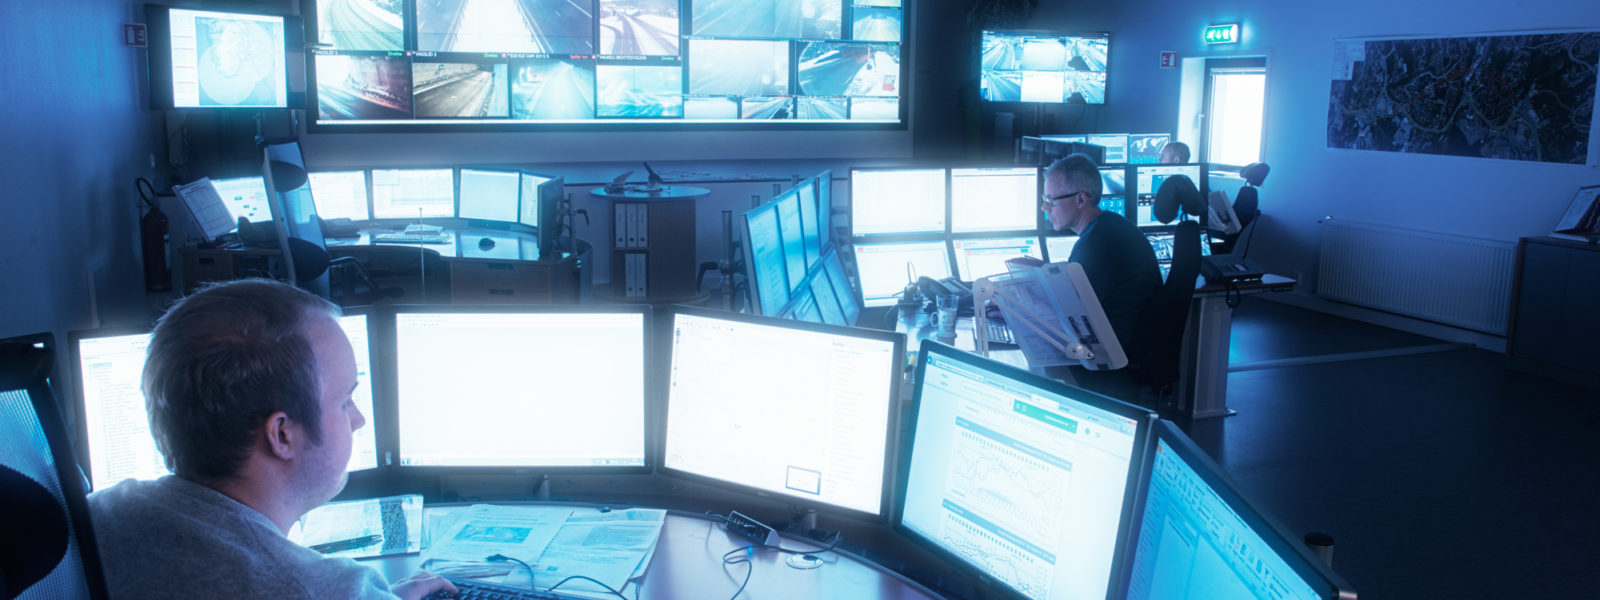 Kontroll- og Overvåkingssystemer